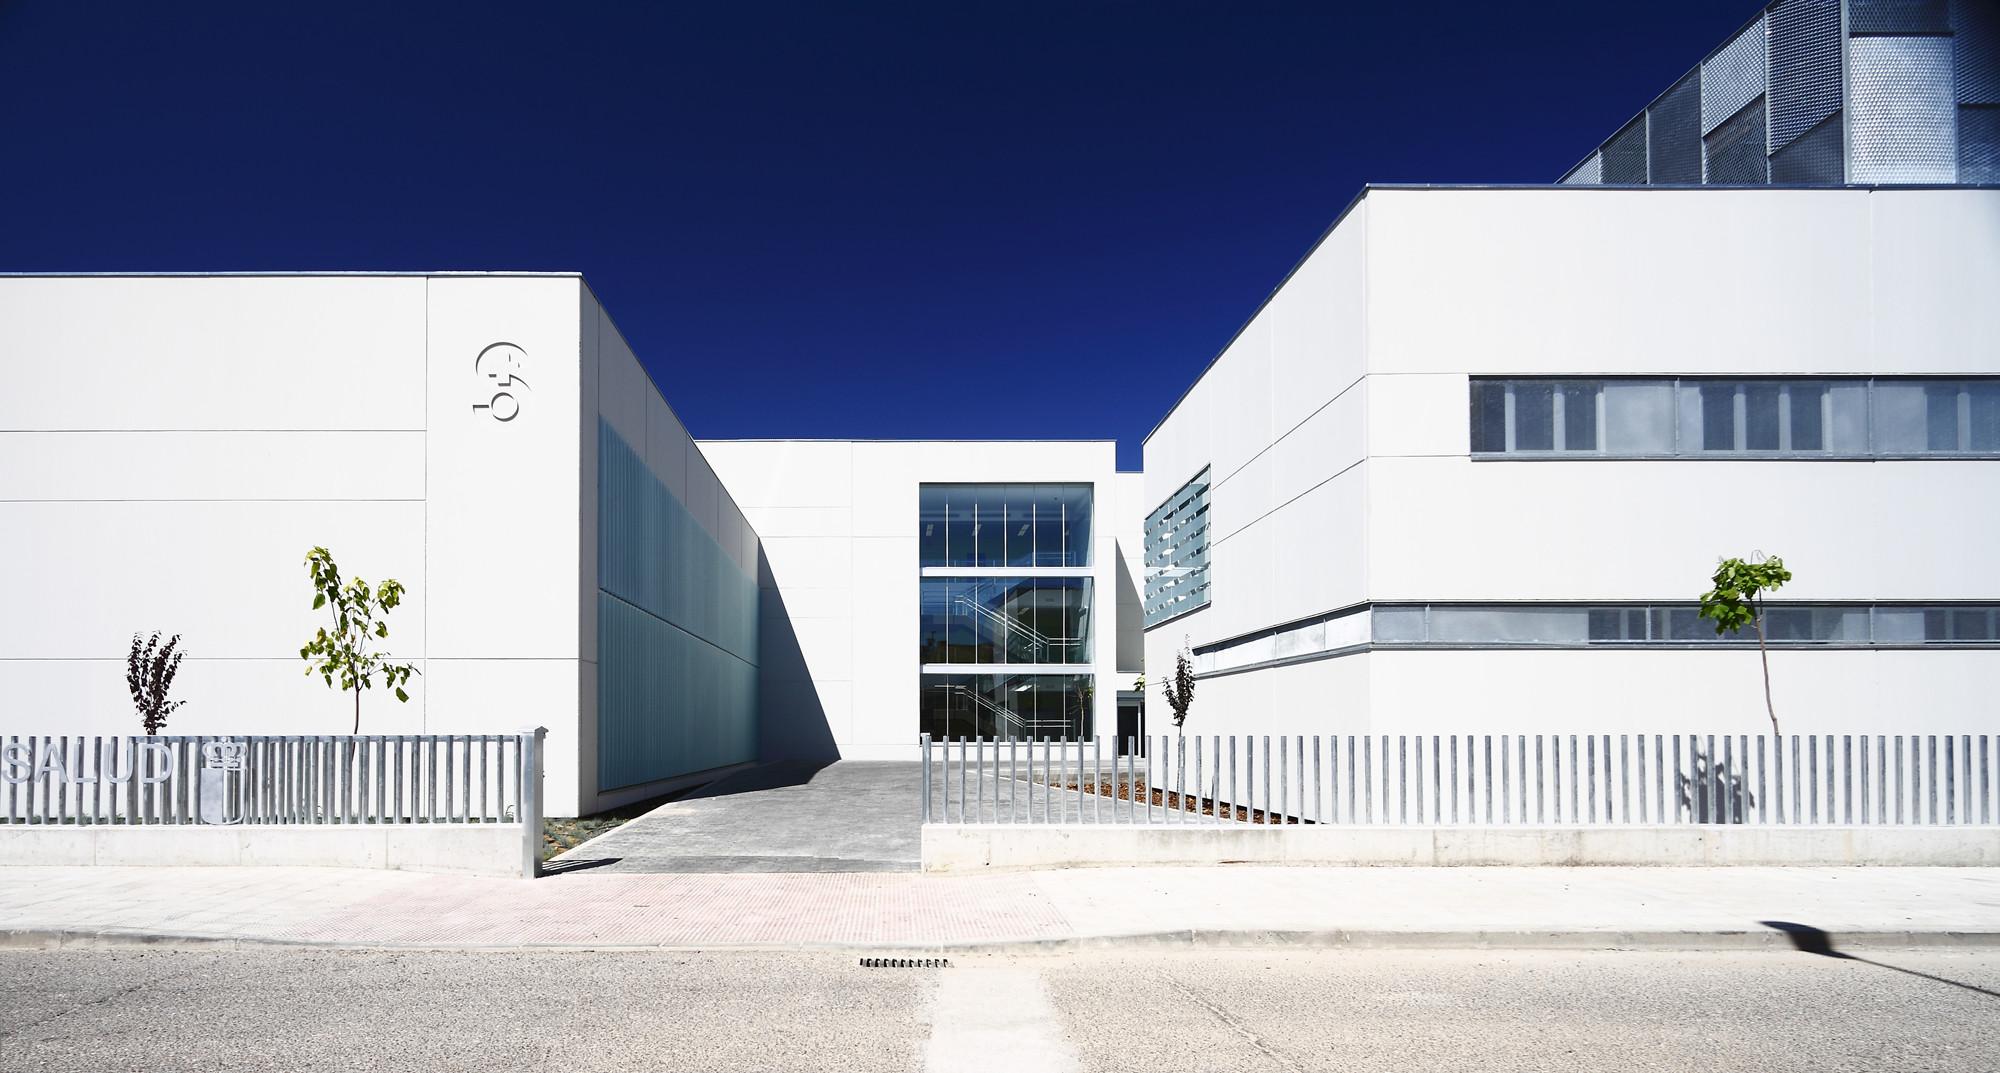 Centro de salud talavera v bat arquitecnica archdaily m xico - Muebles moreno talavera ...